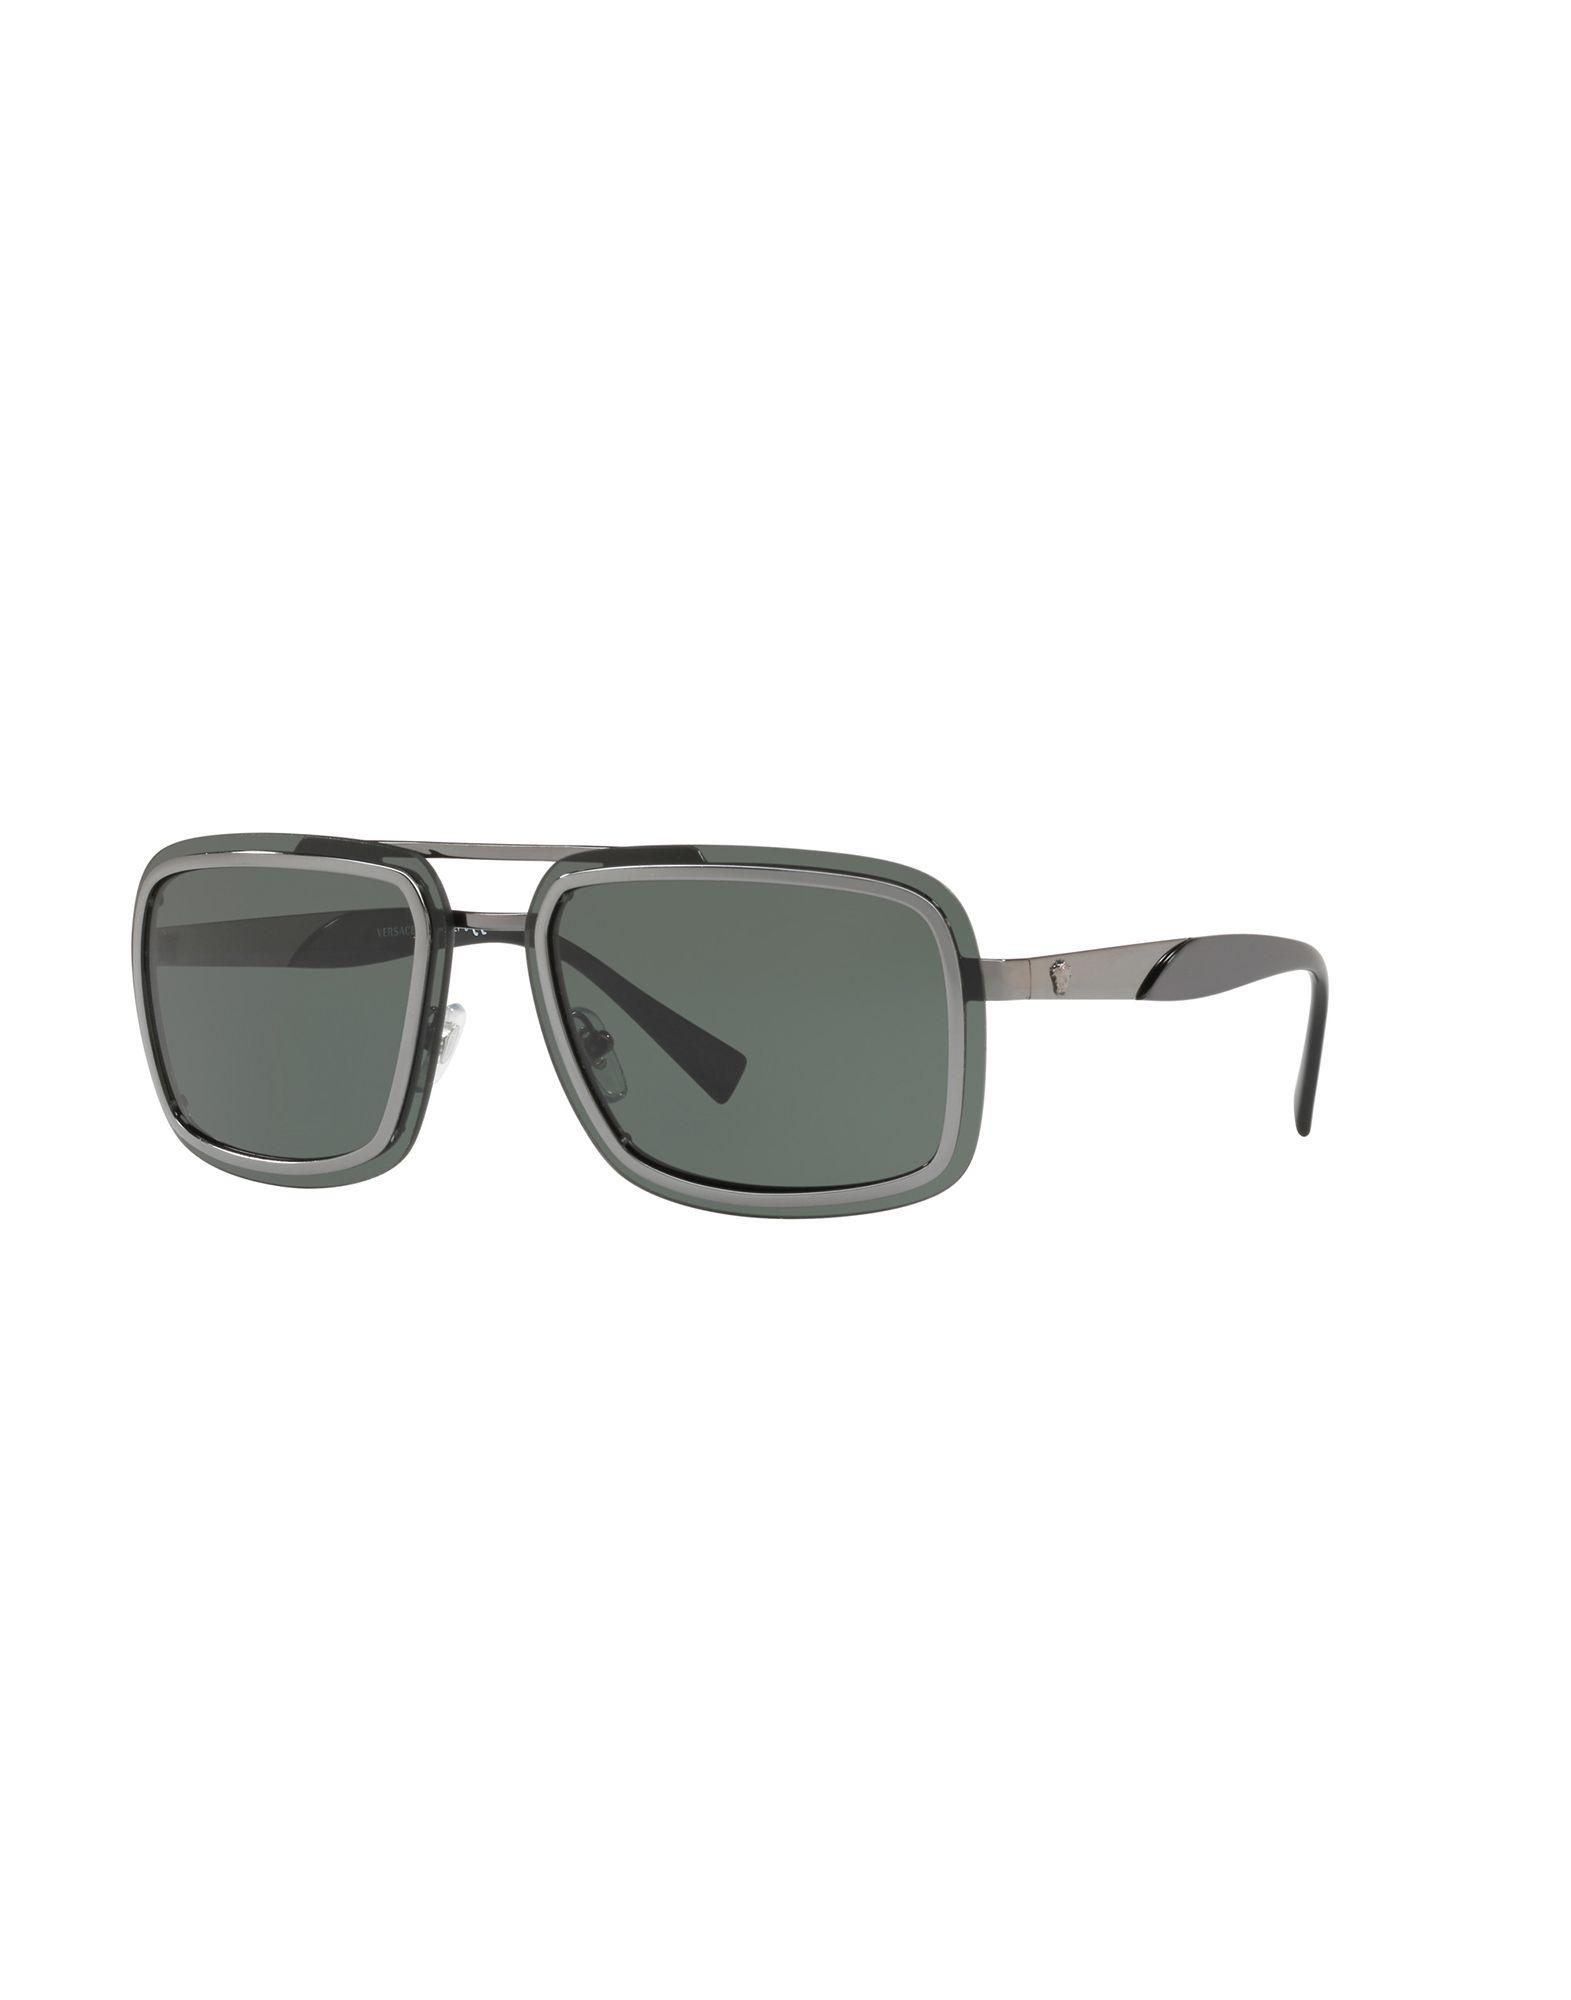 Occhiali Da Sole Versace Ve2183 - Uomo - Acquista online su